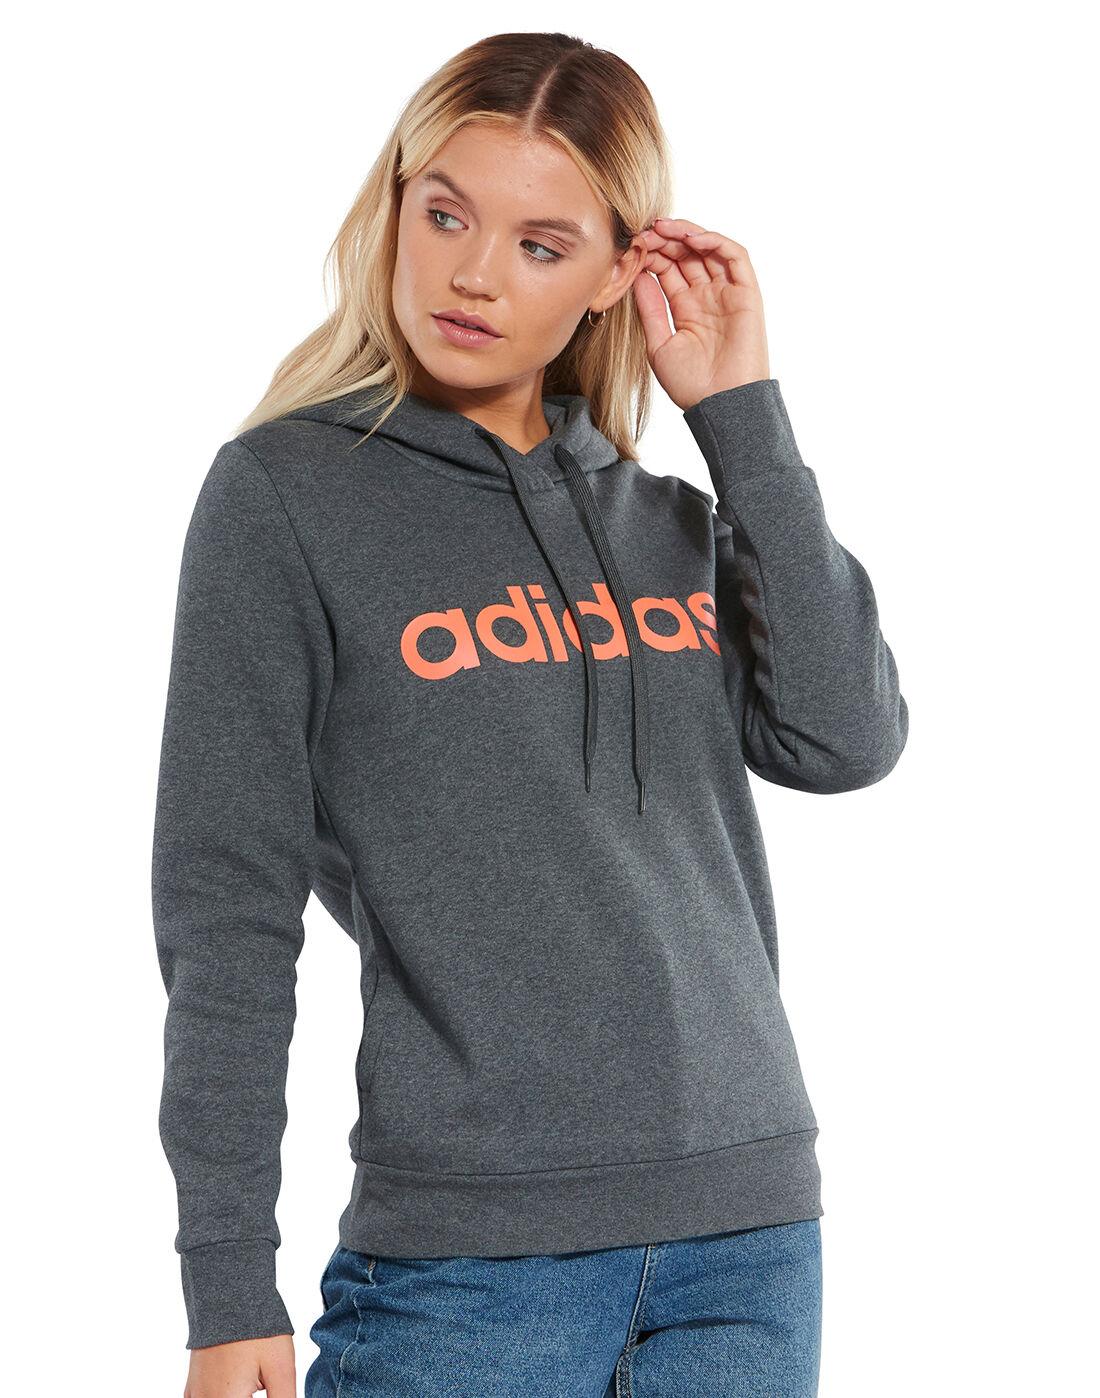 artillería los Impresión  adidas hoodie women's Online Shopping for Women, Men, Kids Fashion &  Lifestyle Free Delivery & Returns! -